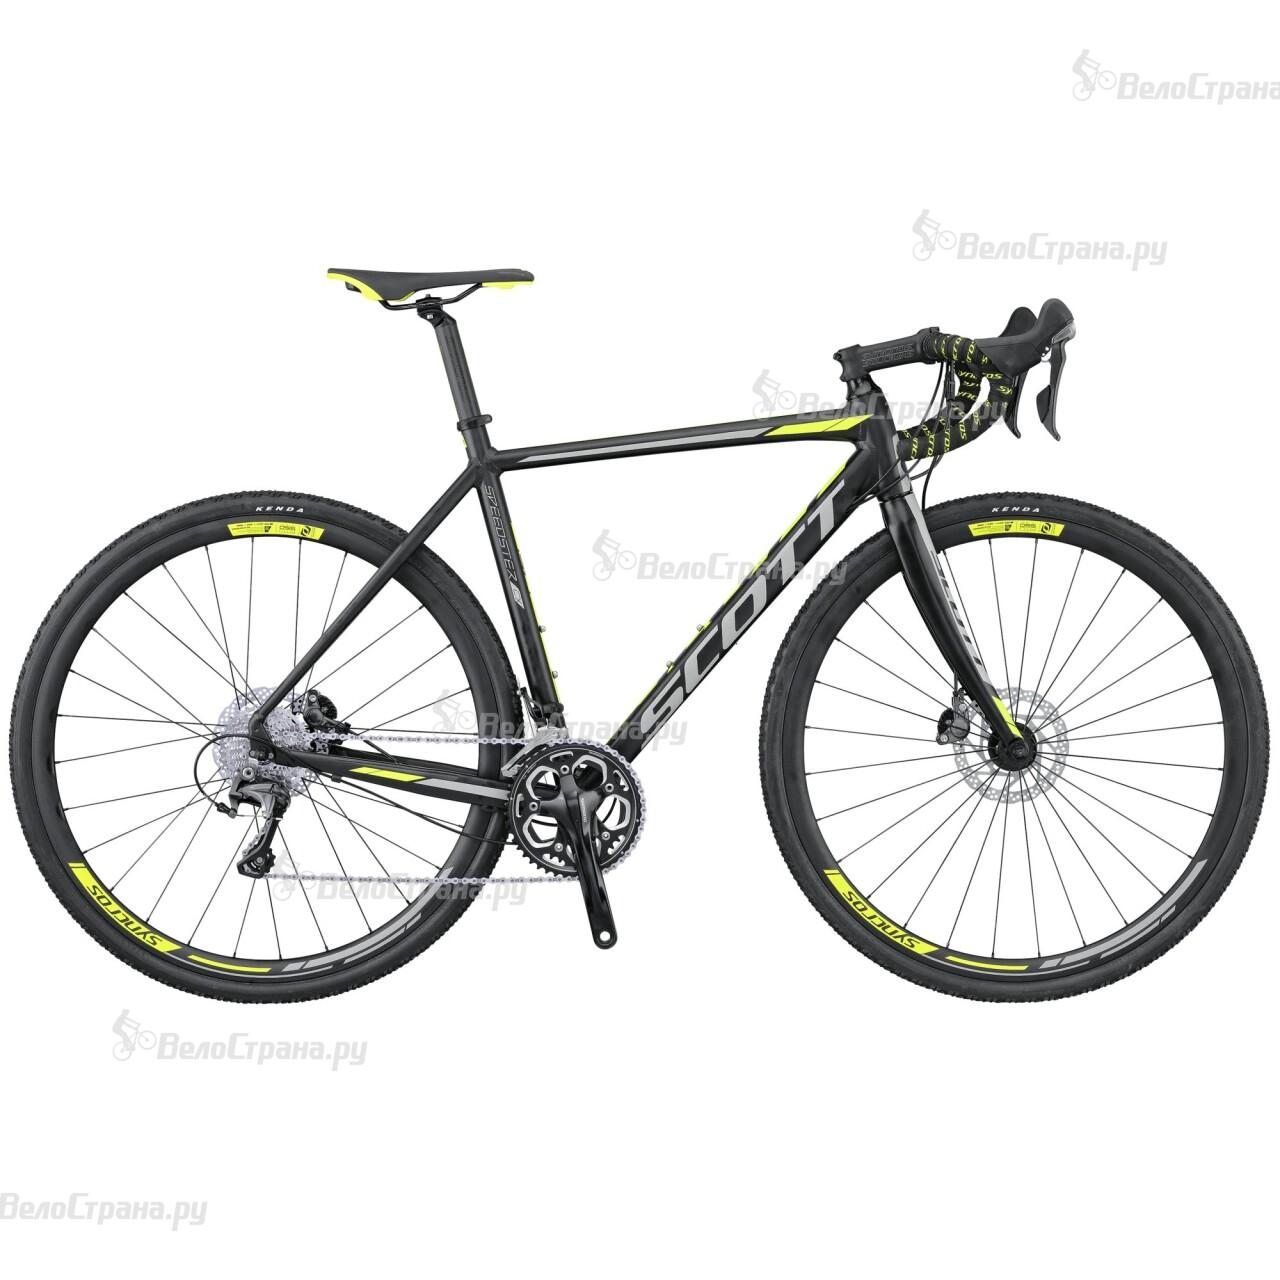 Велосипед Scott Speedster CX 10 Disc (2016)